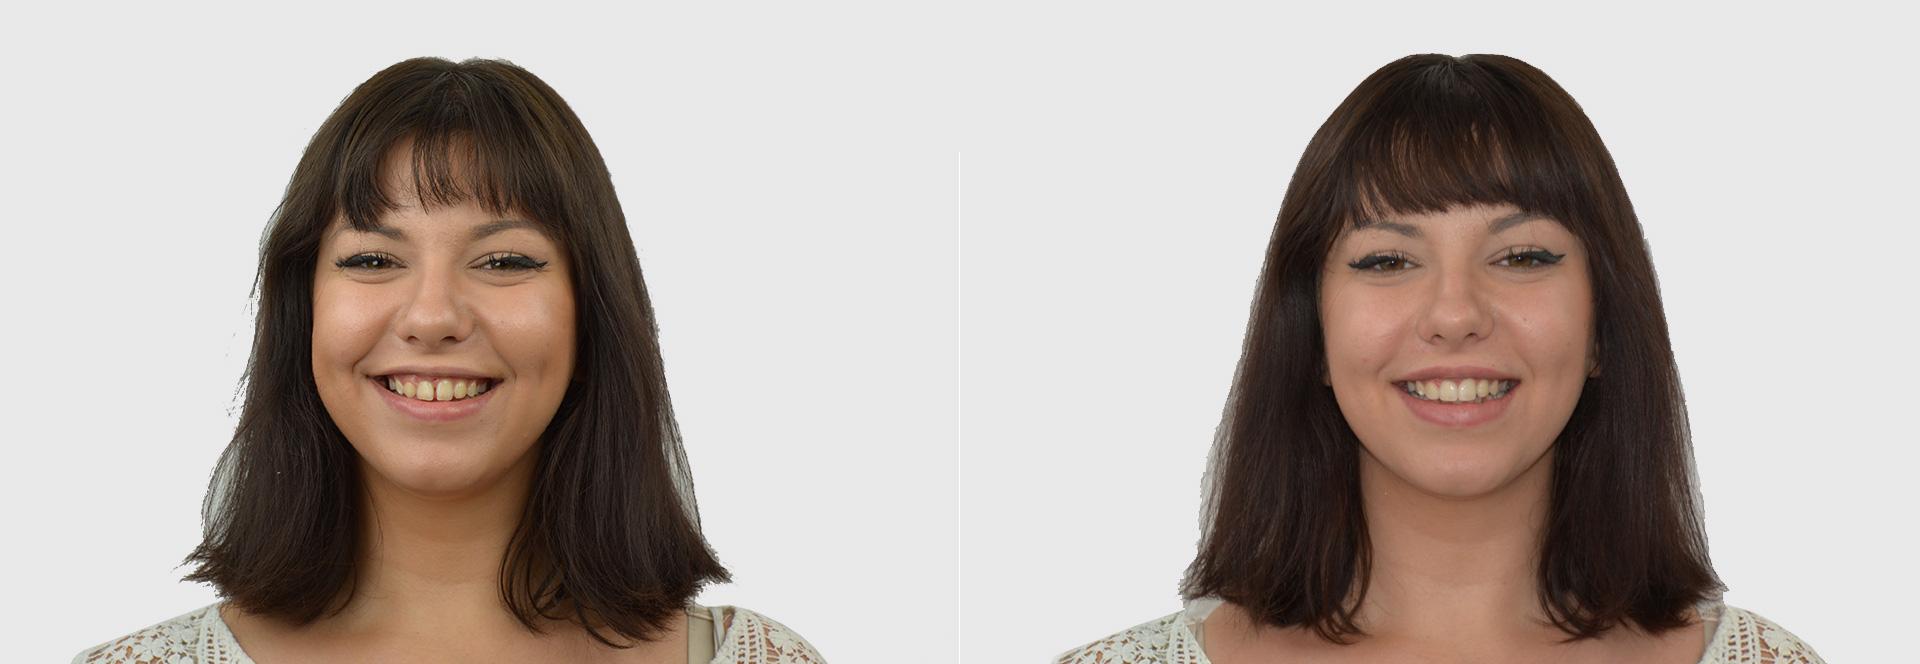 agenesia dentale diastema faccette